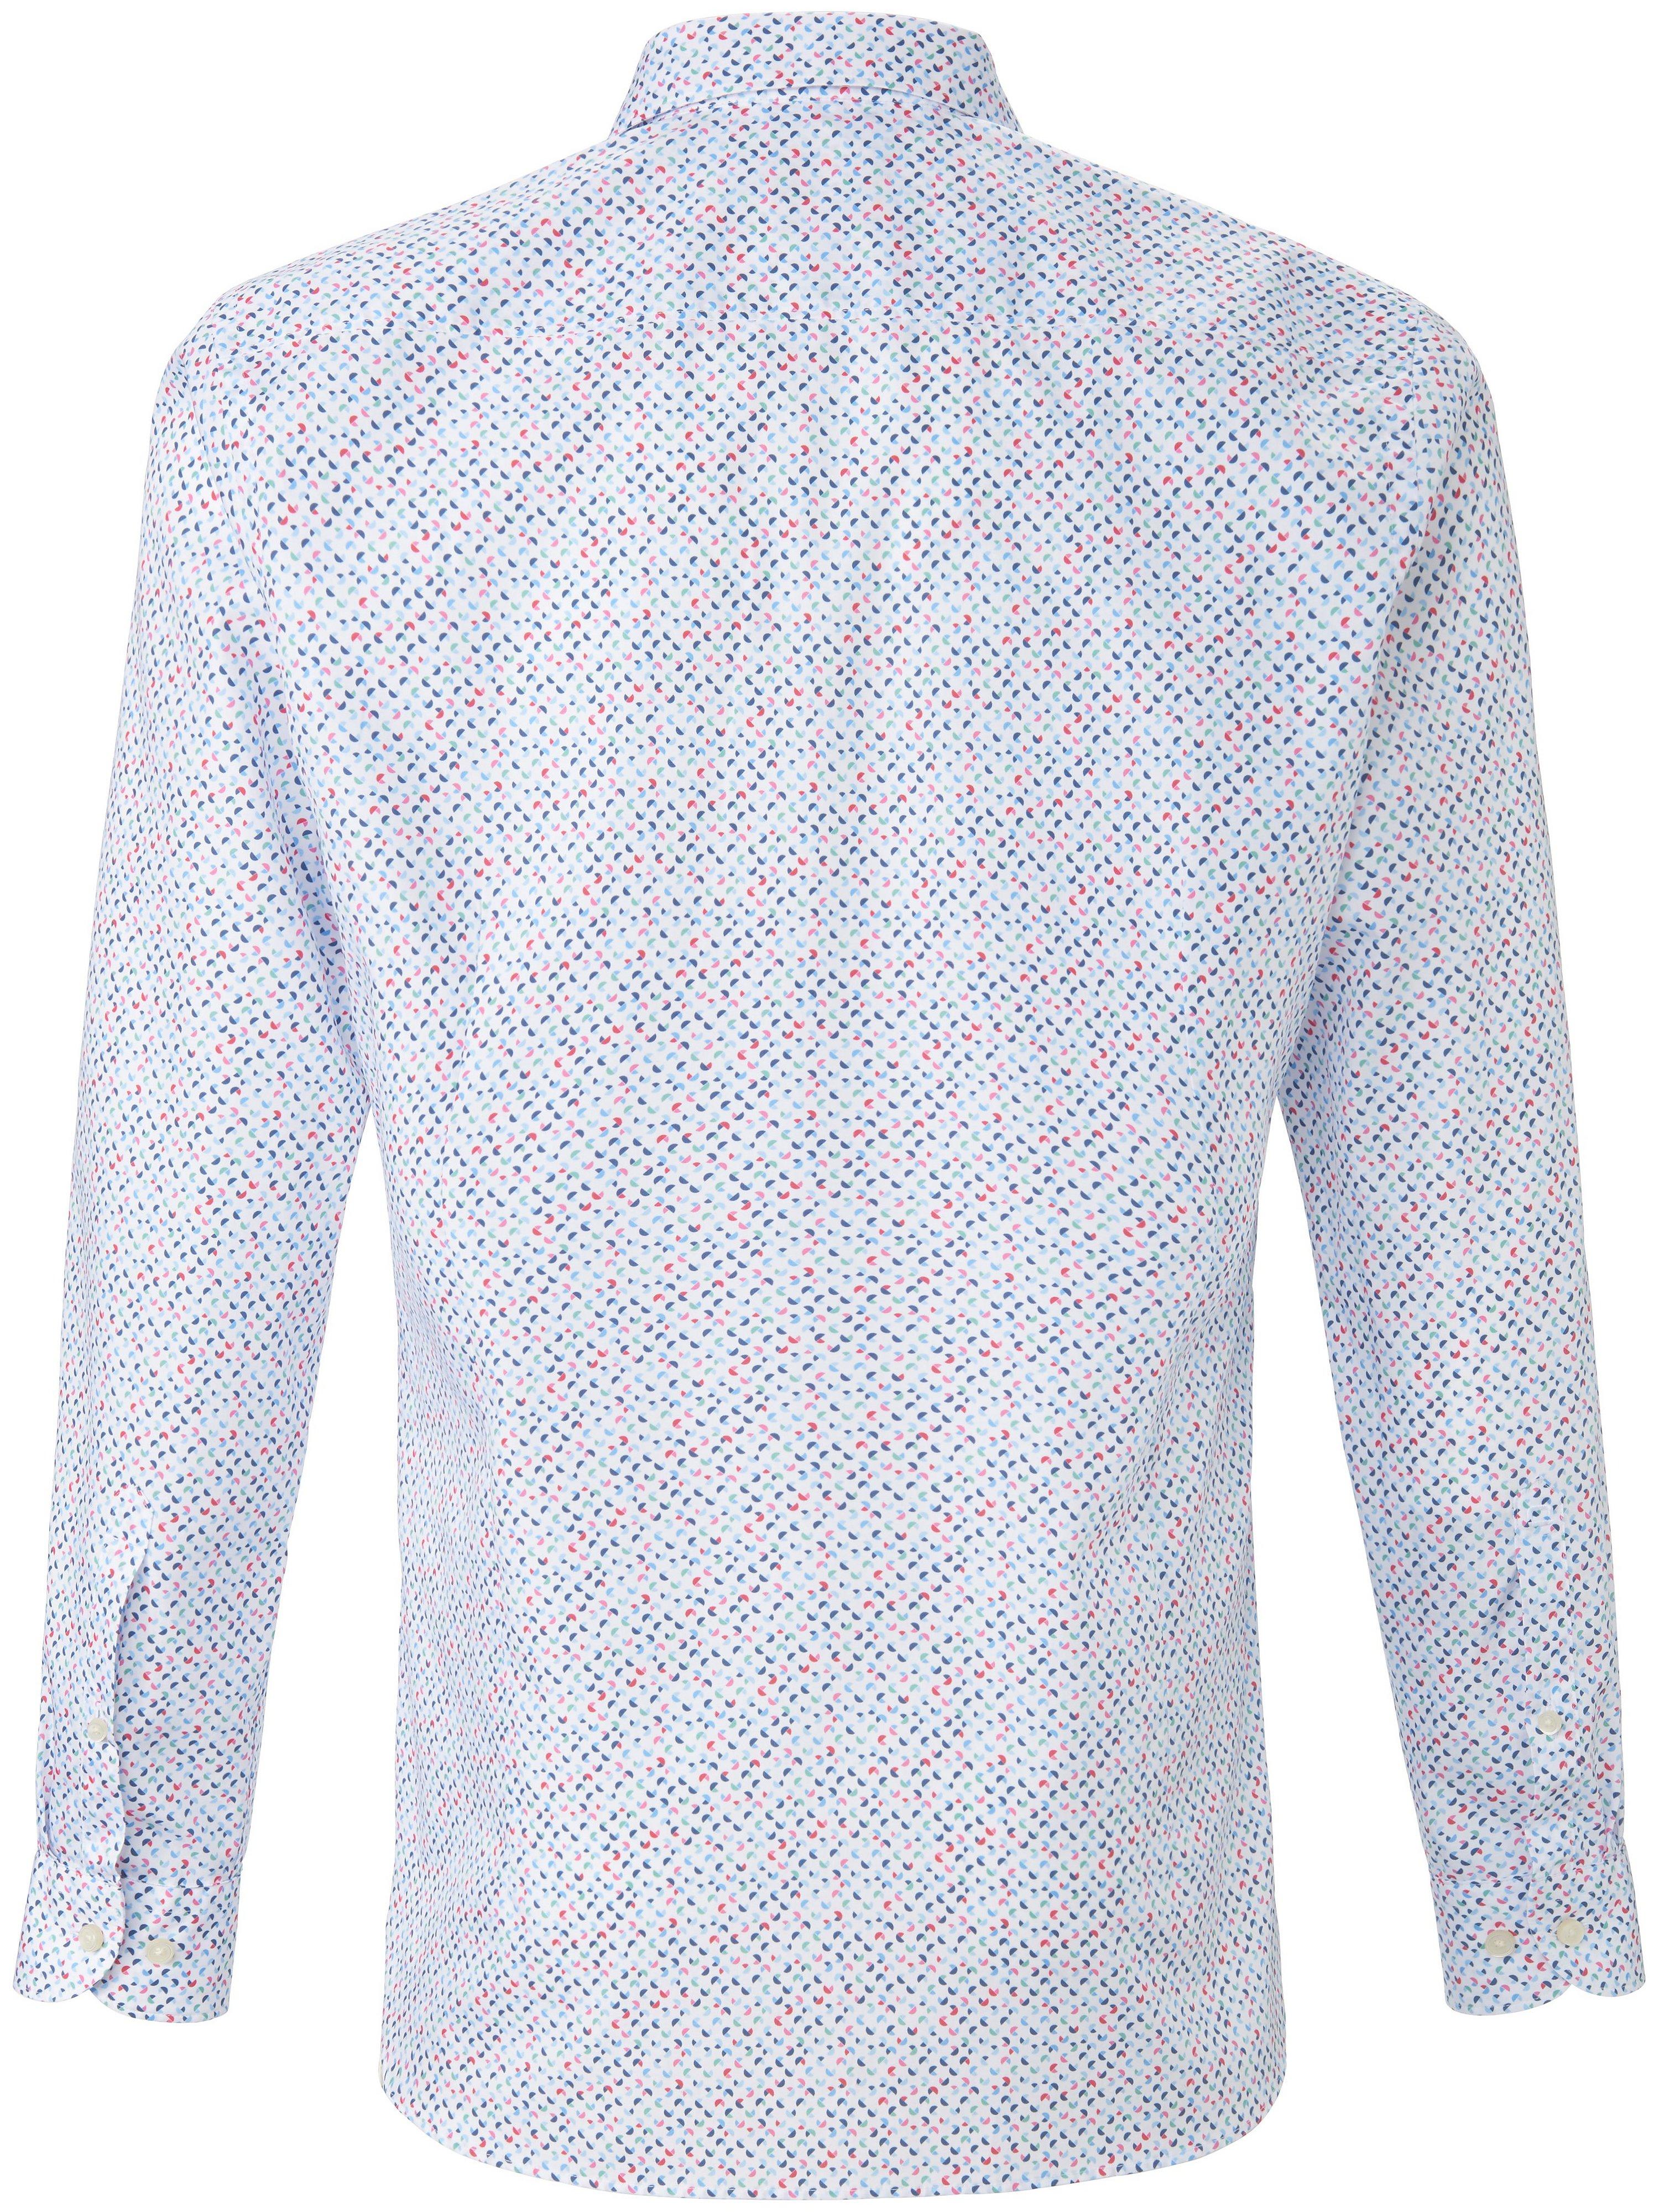 Skjorte pasform Body Fit Fra Olymp hvid